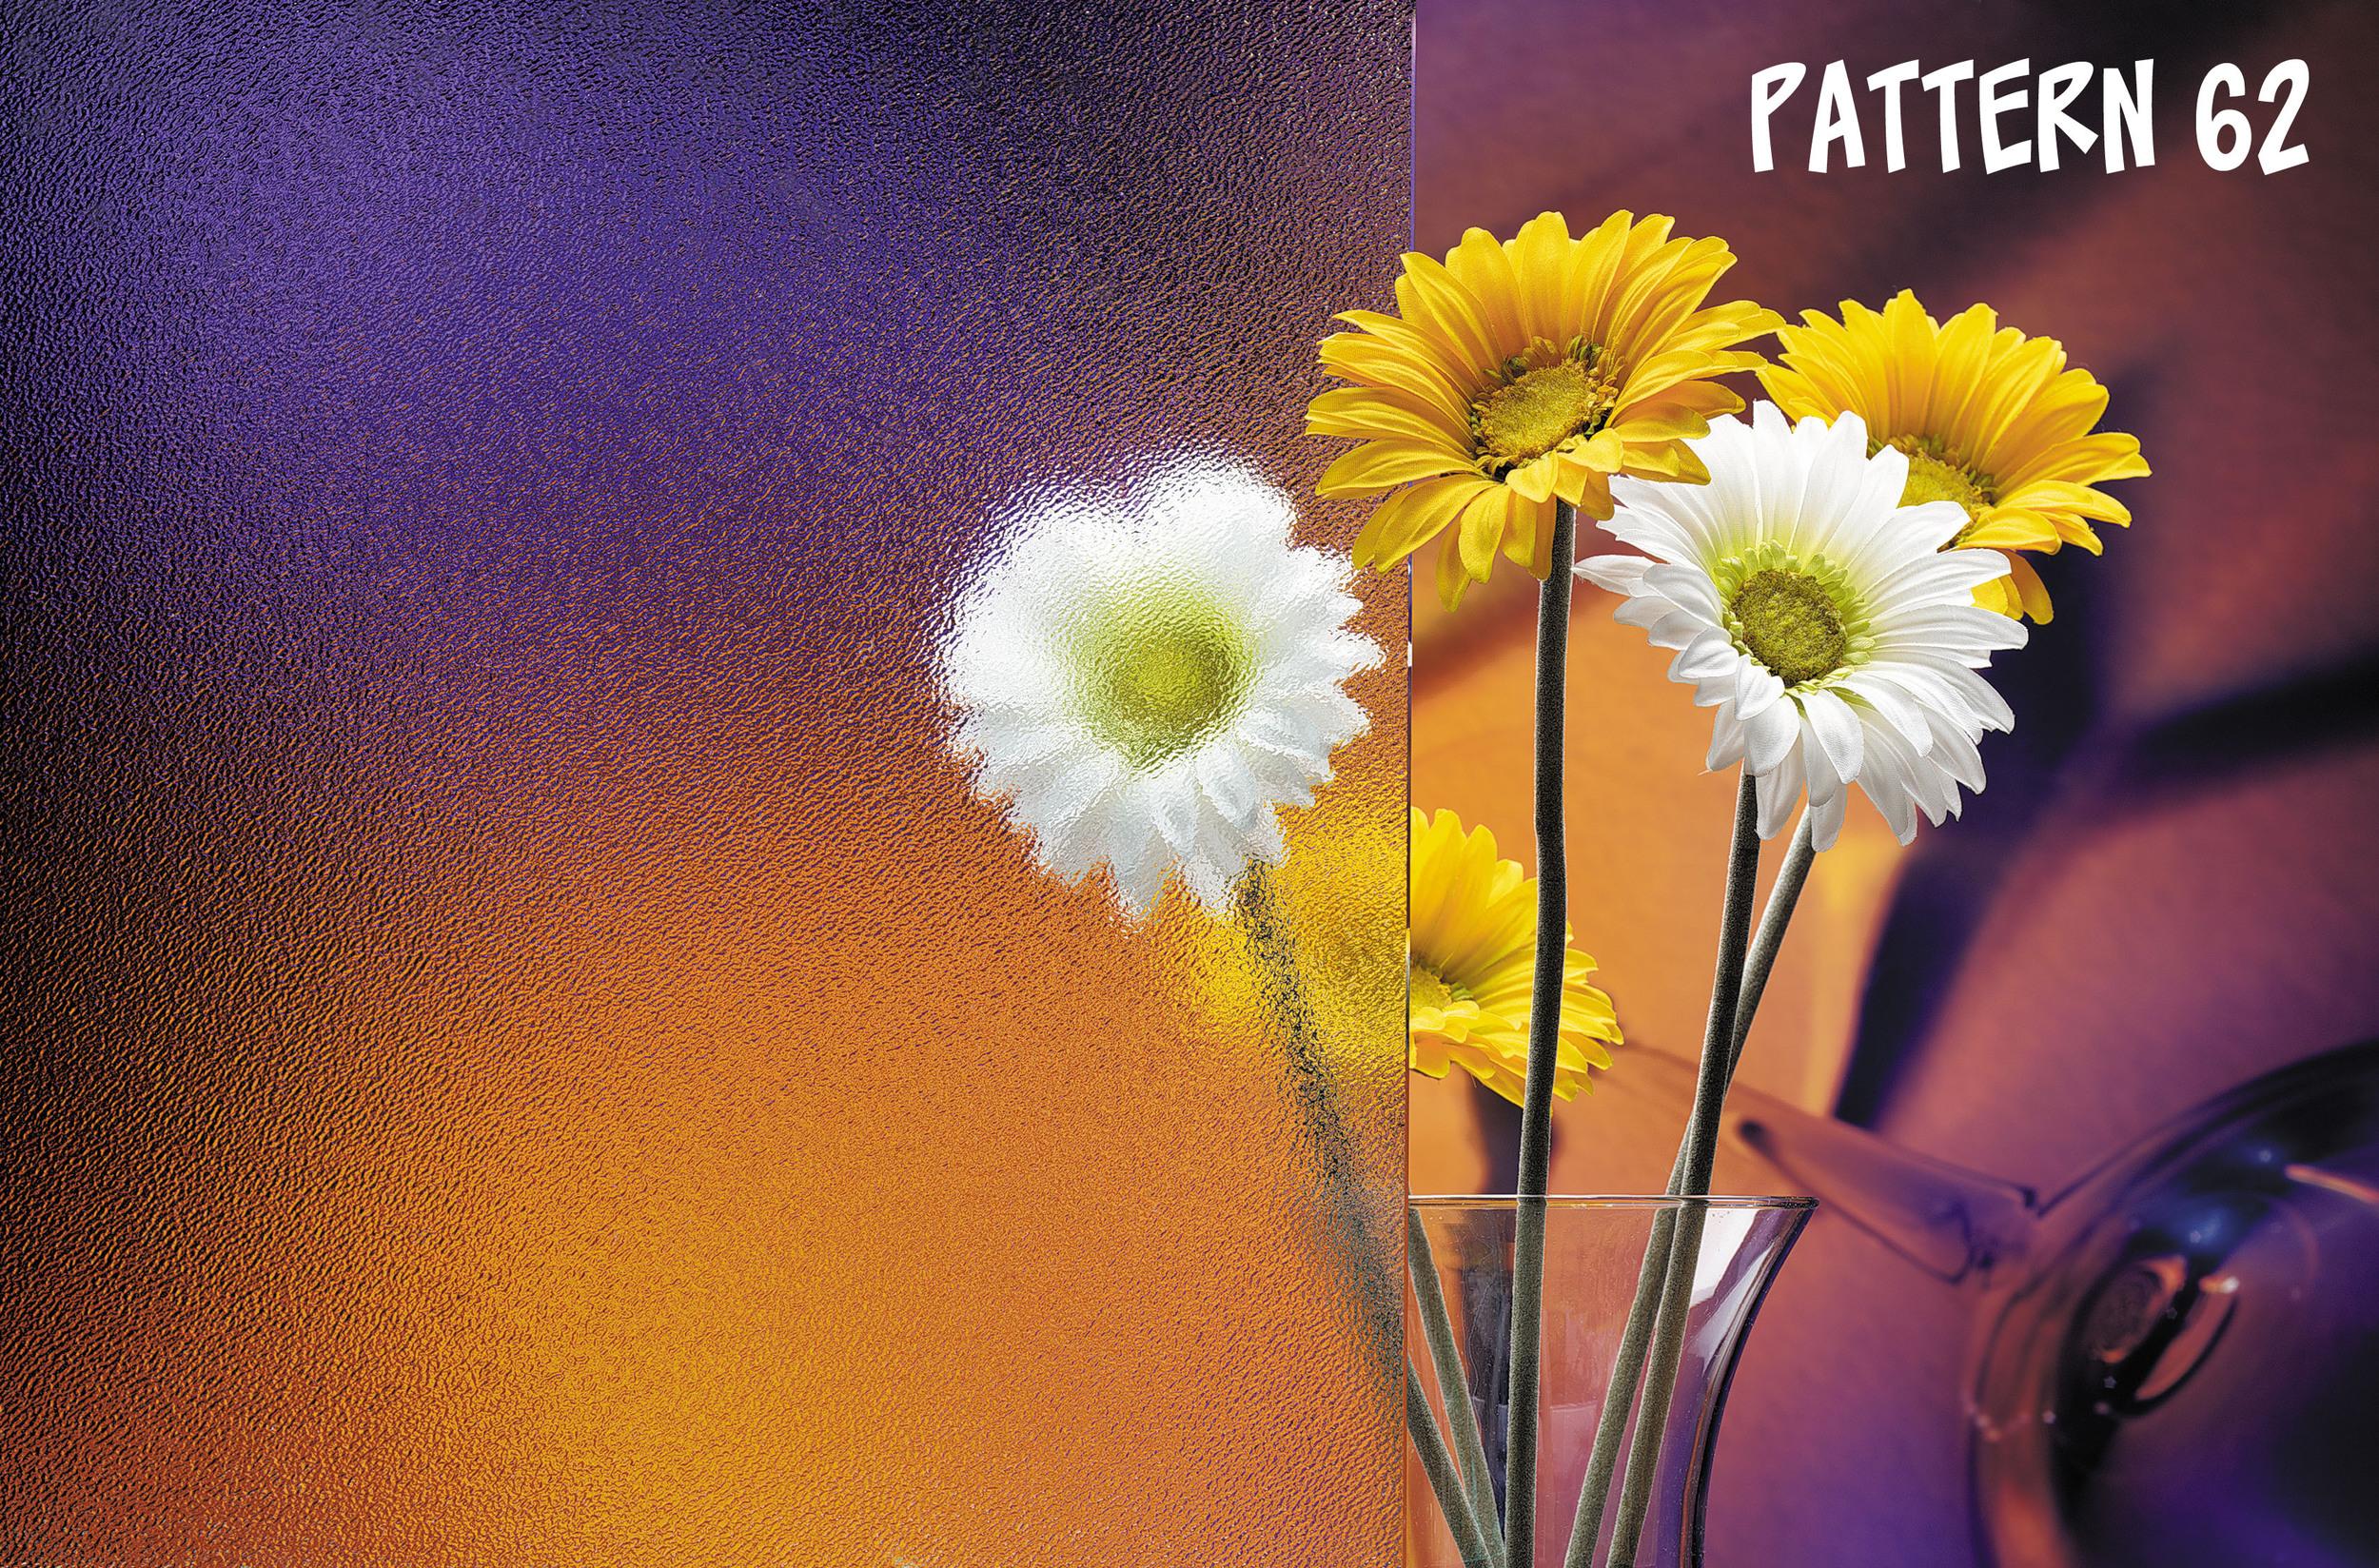 pattern 62-2.jpg